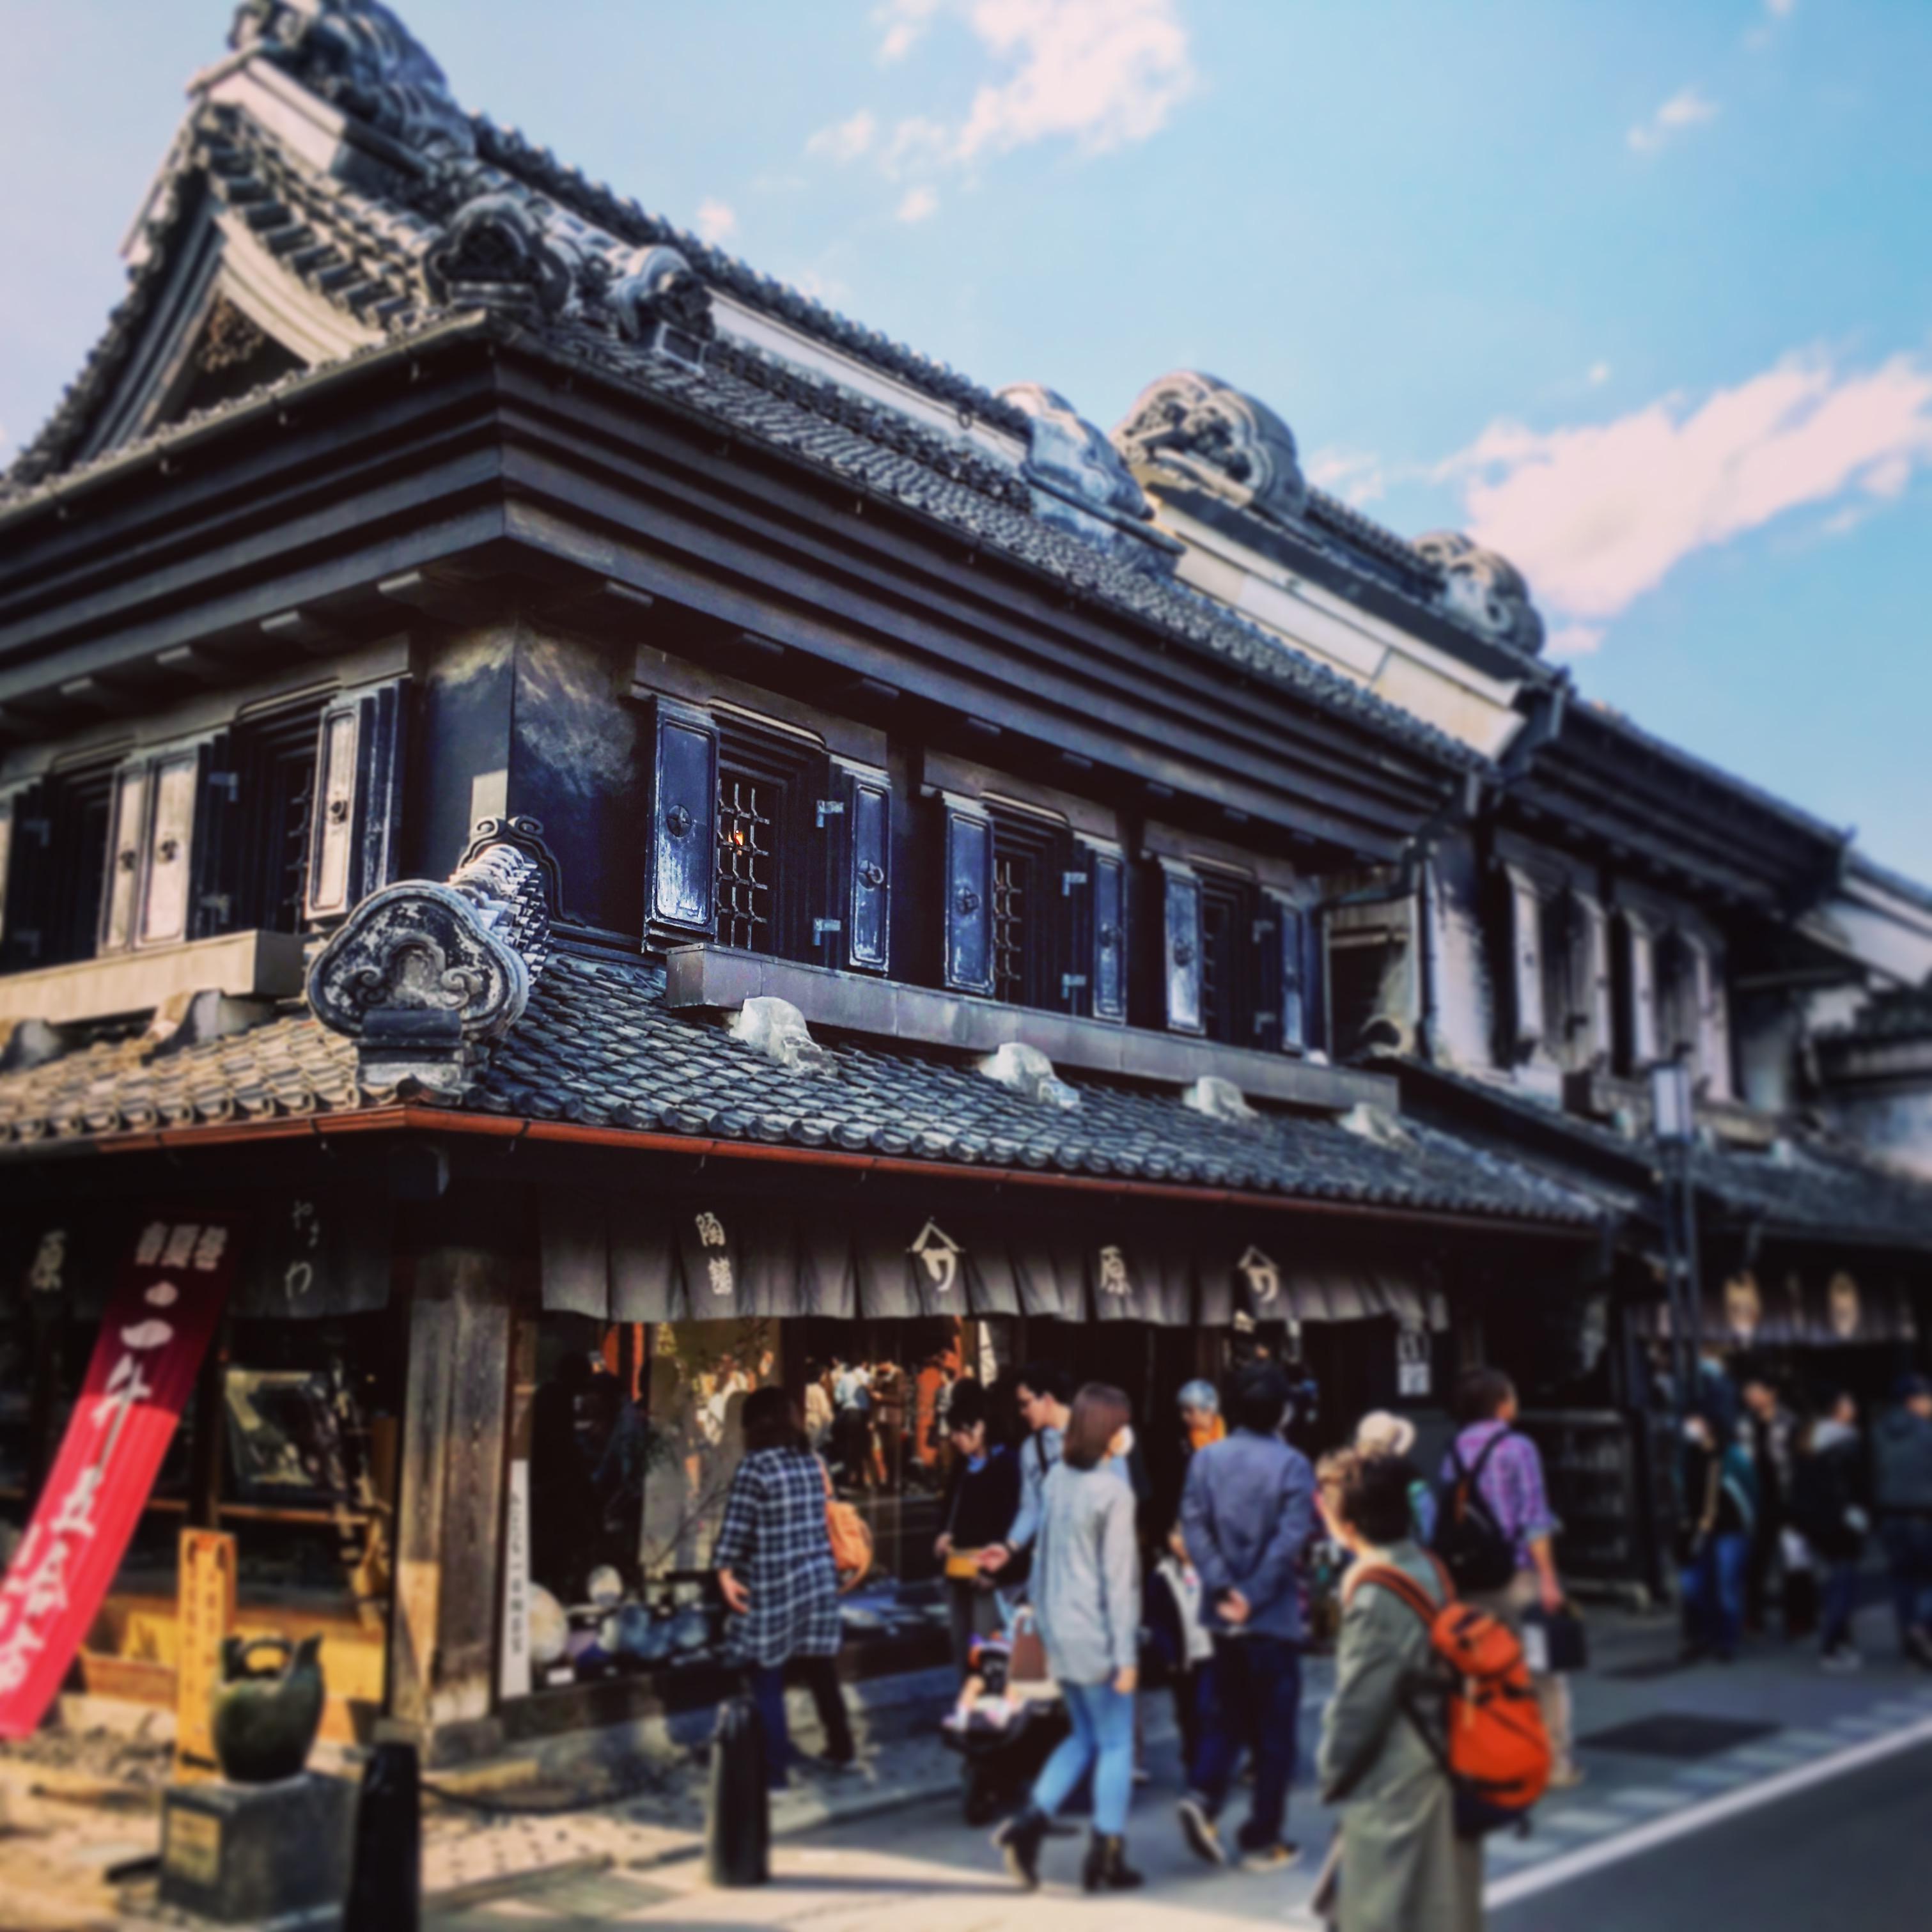 kura storehouse kawagoe day trip